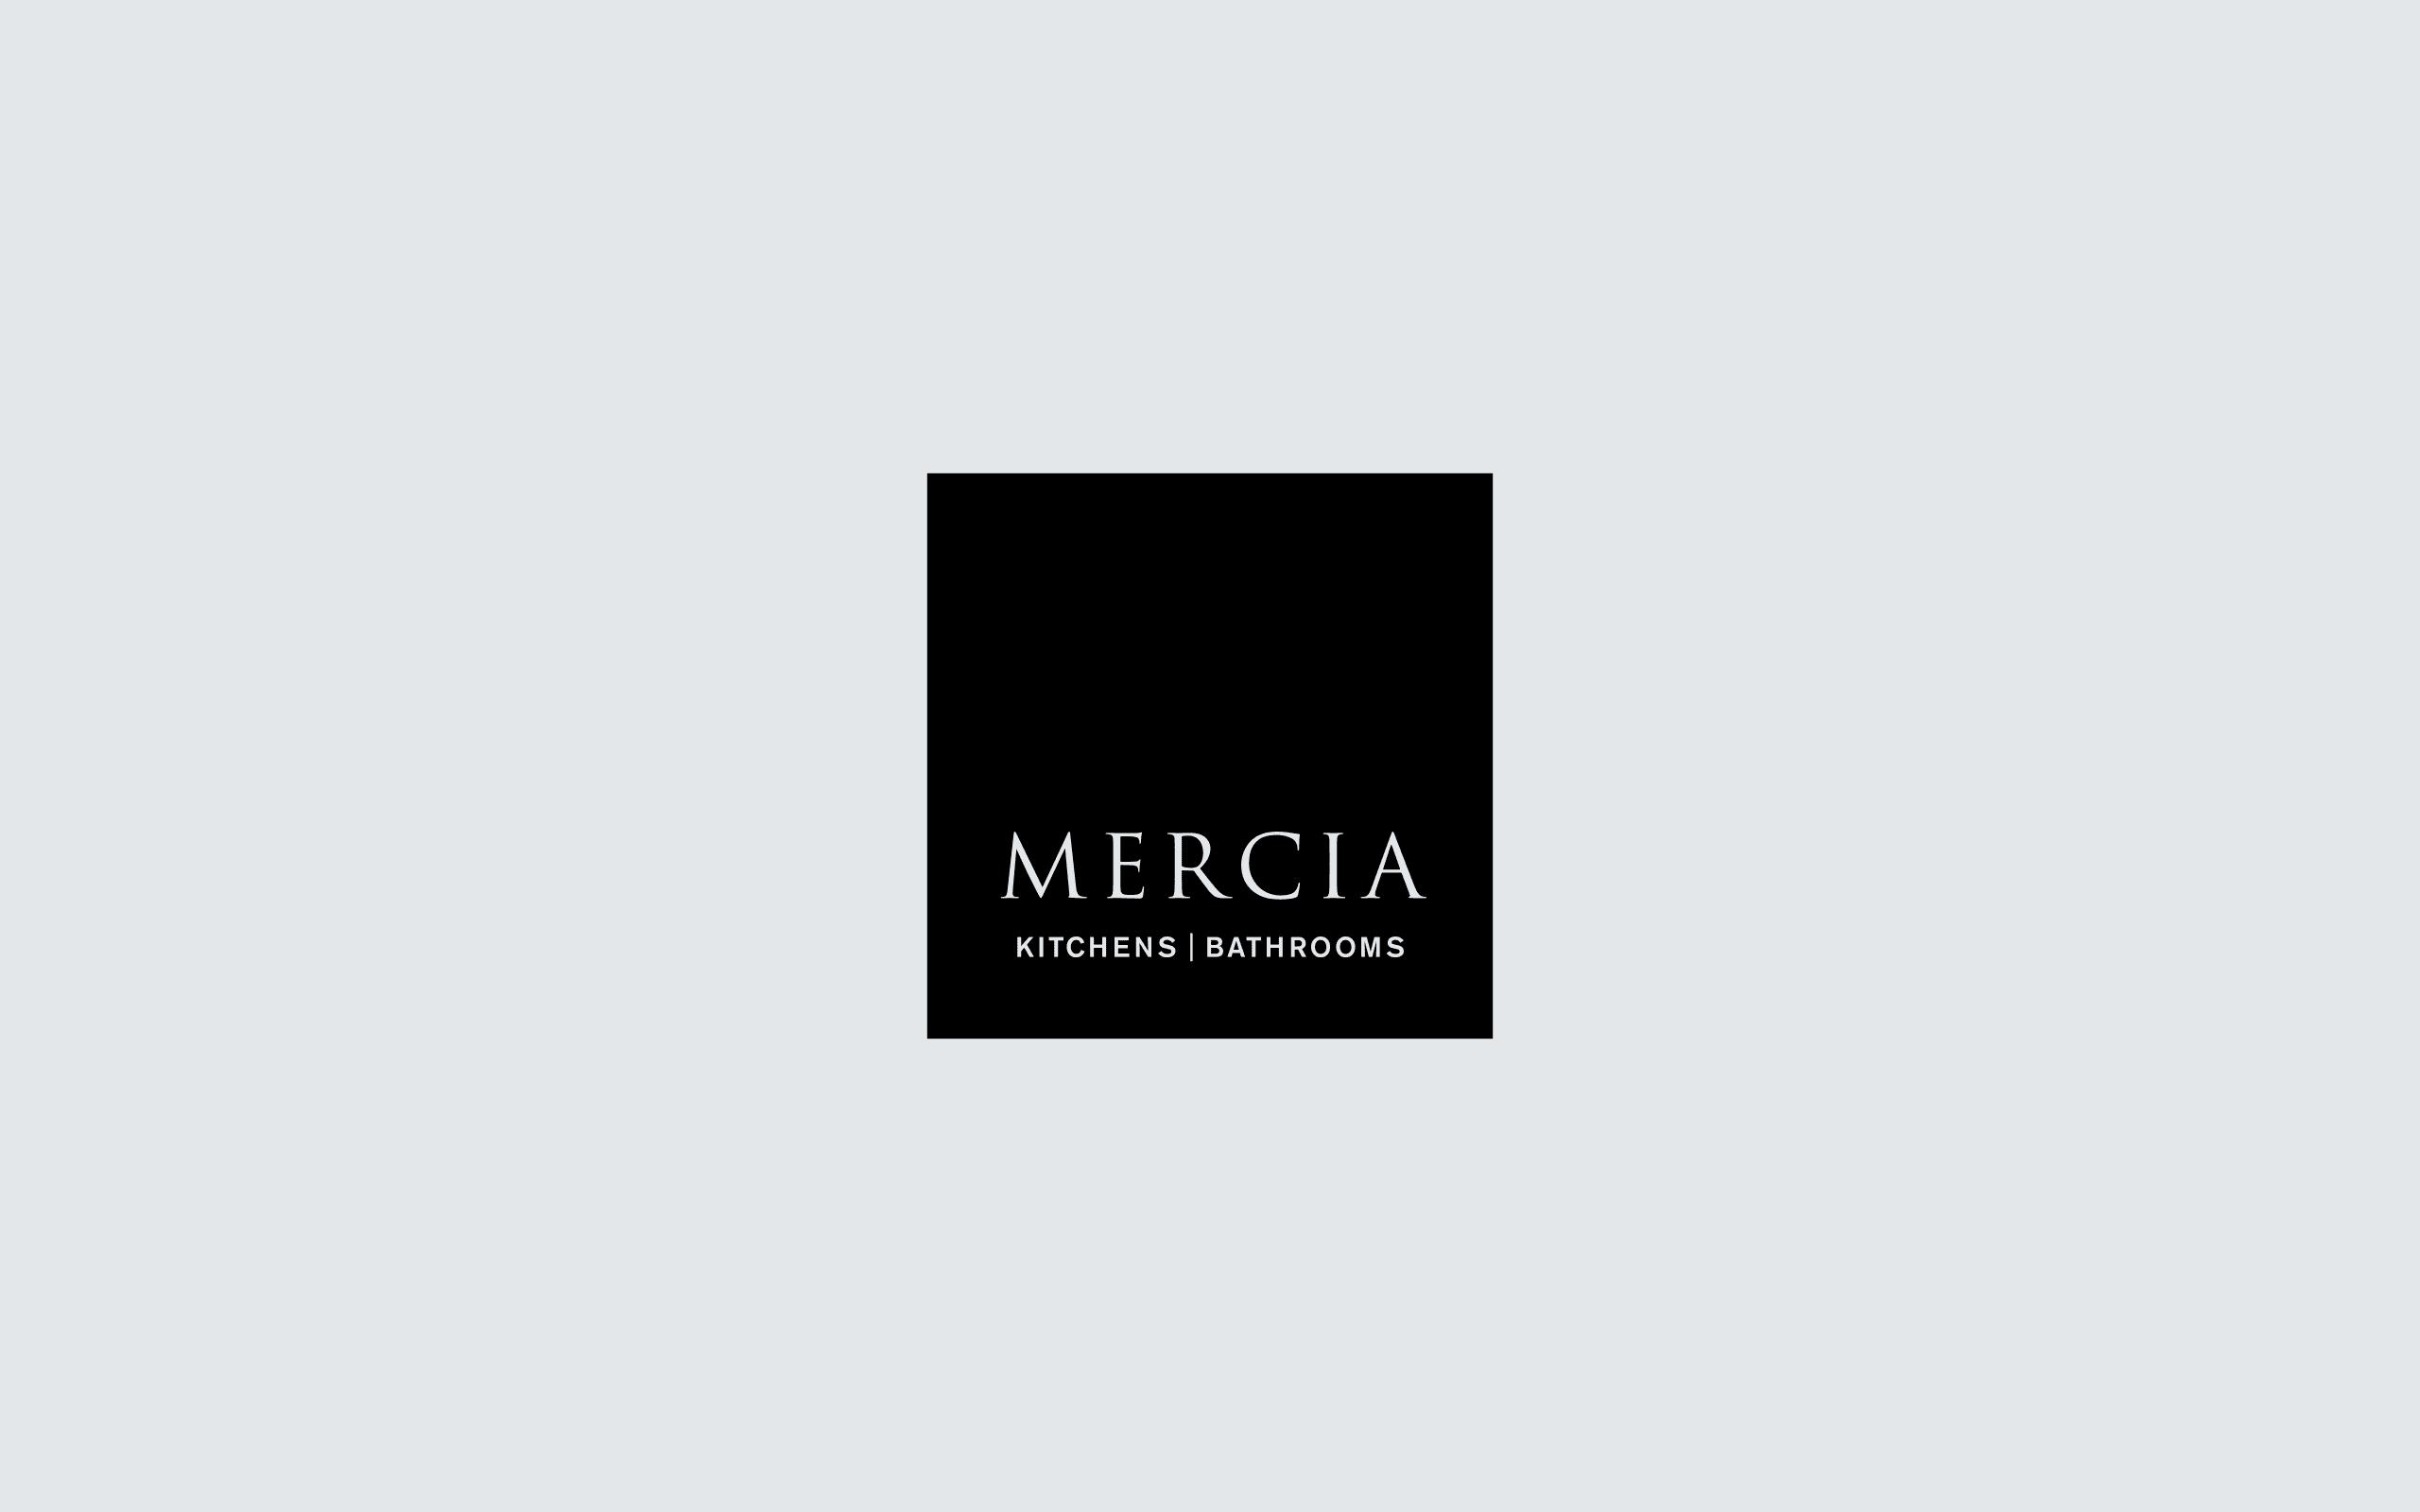 Mercia Kitchens business identity | Zeke Creative